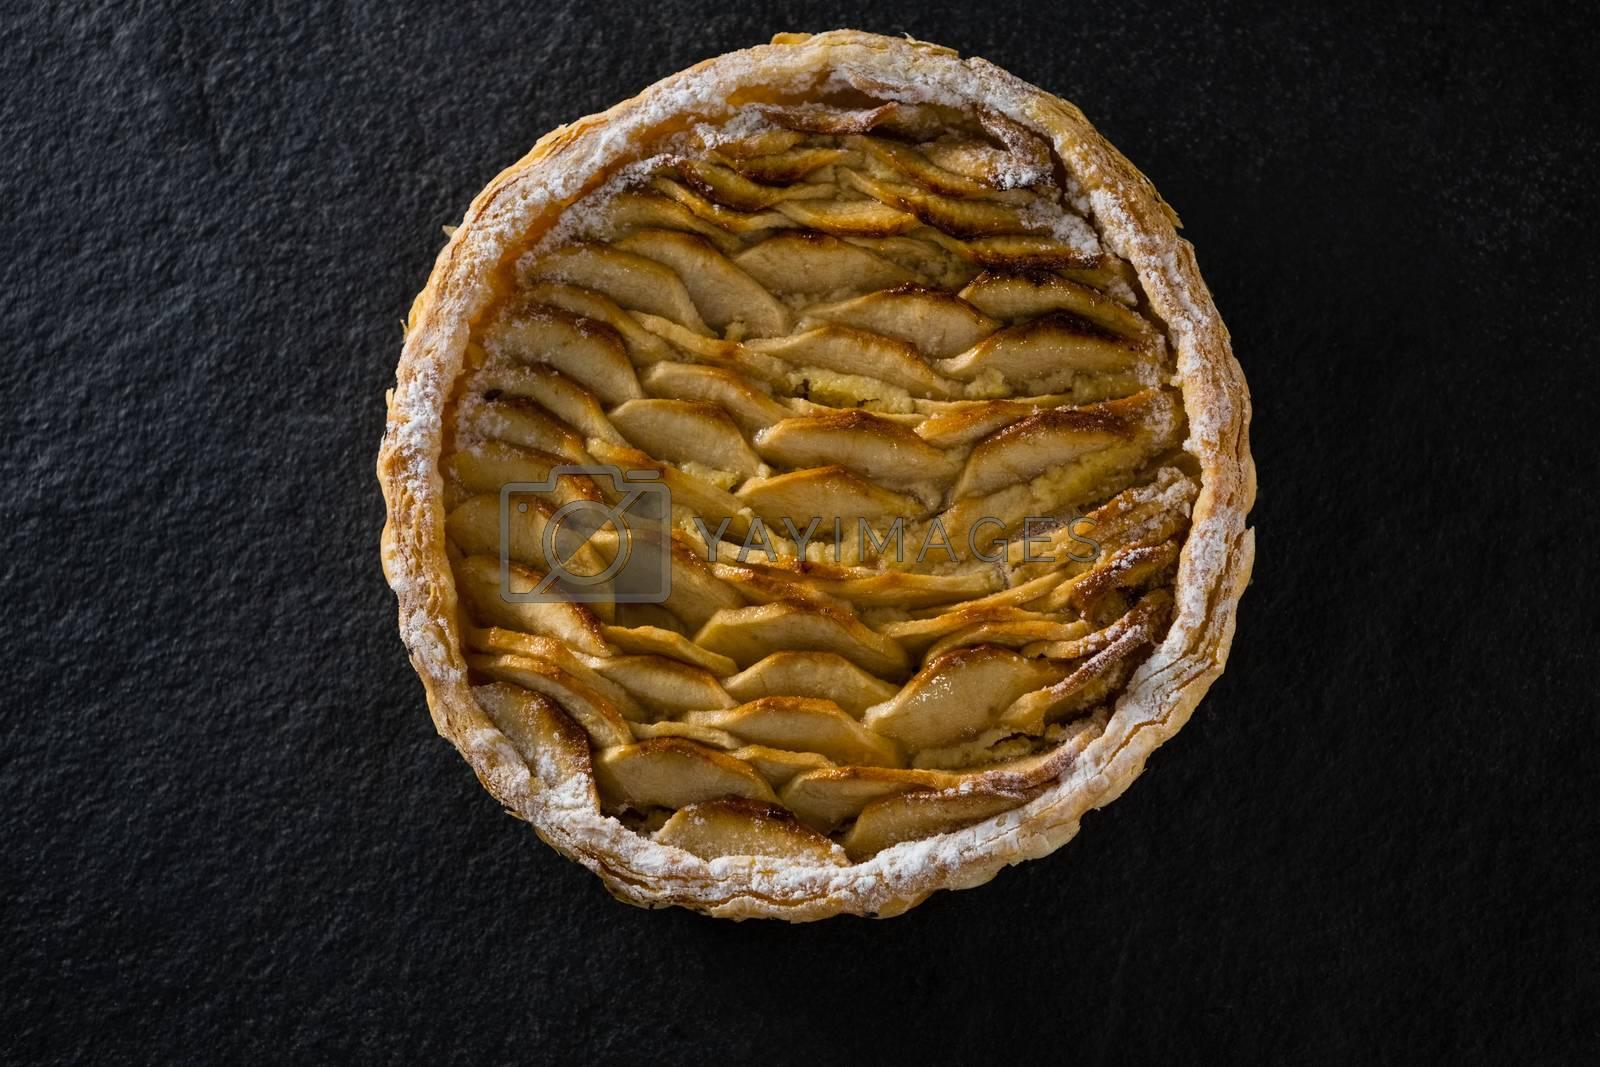 Close-up of apple tart by Wavebreakmedia